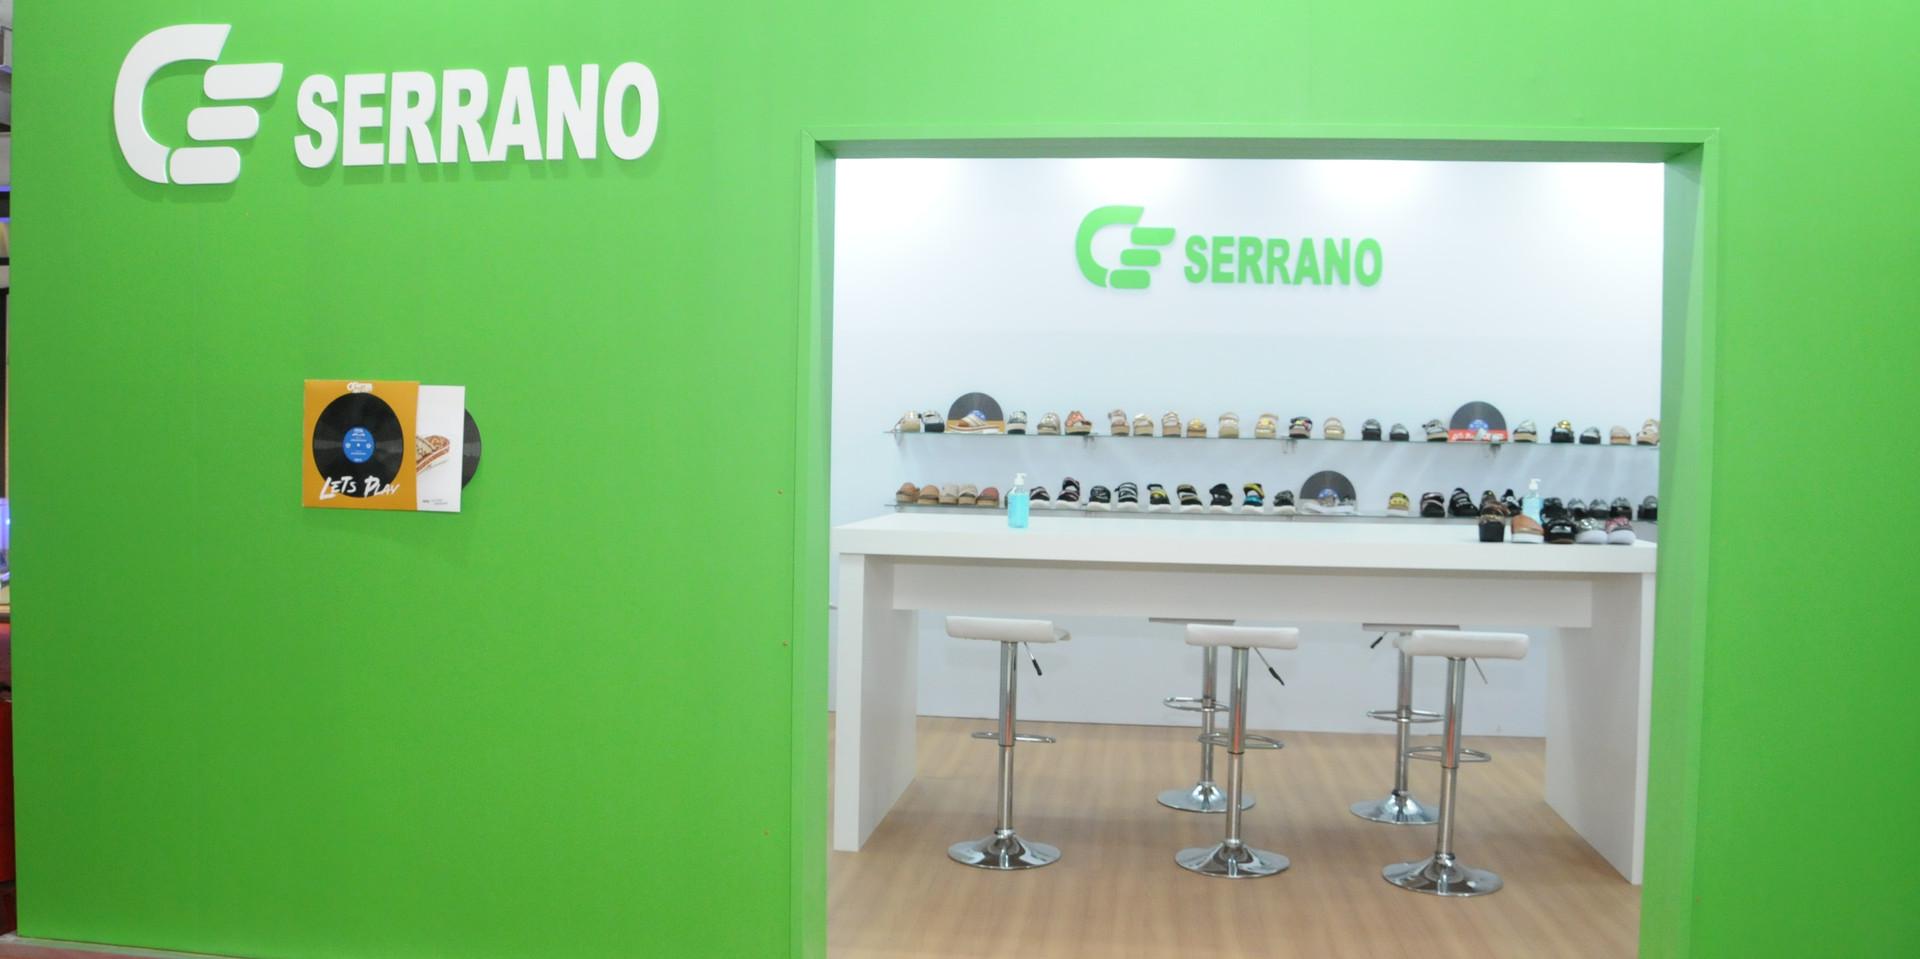 Serrano_(3)[1].JPG